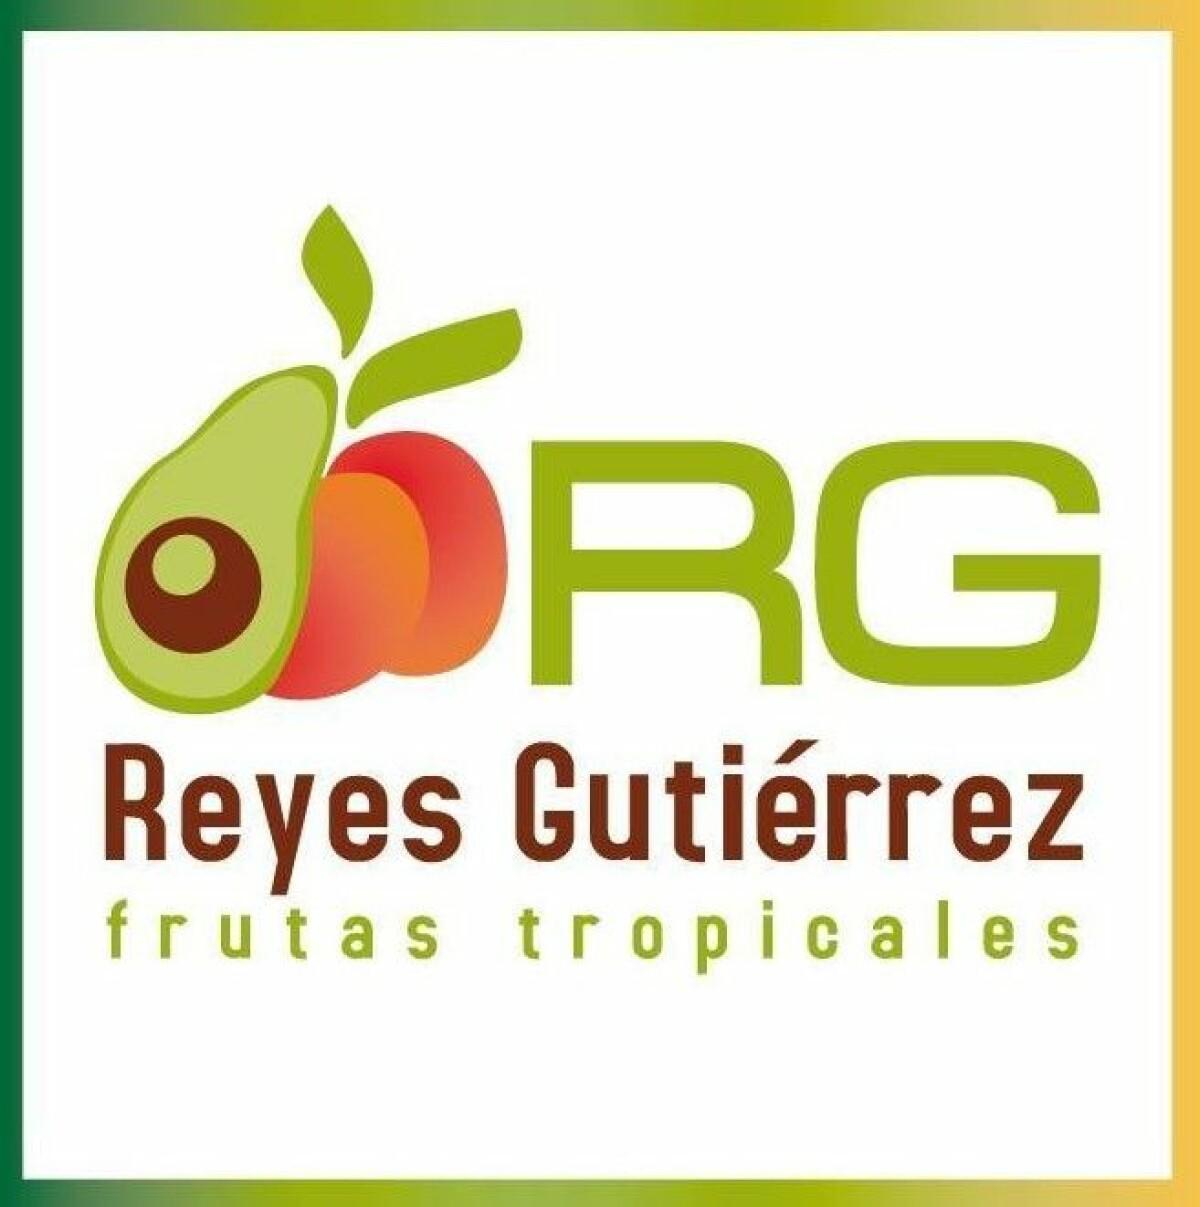 Reyes Gutiérrez, frutas tropicales